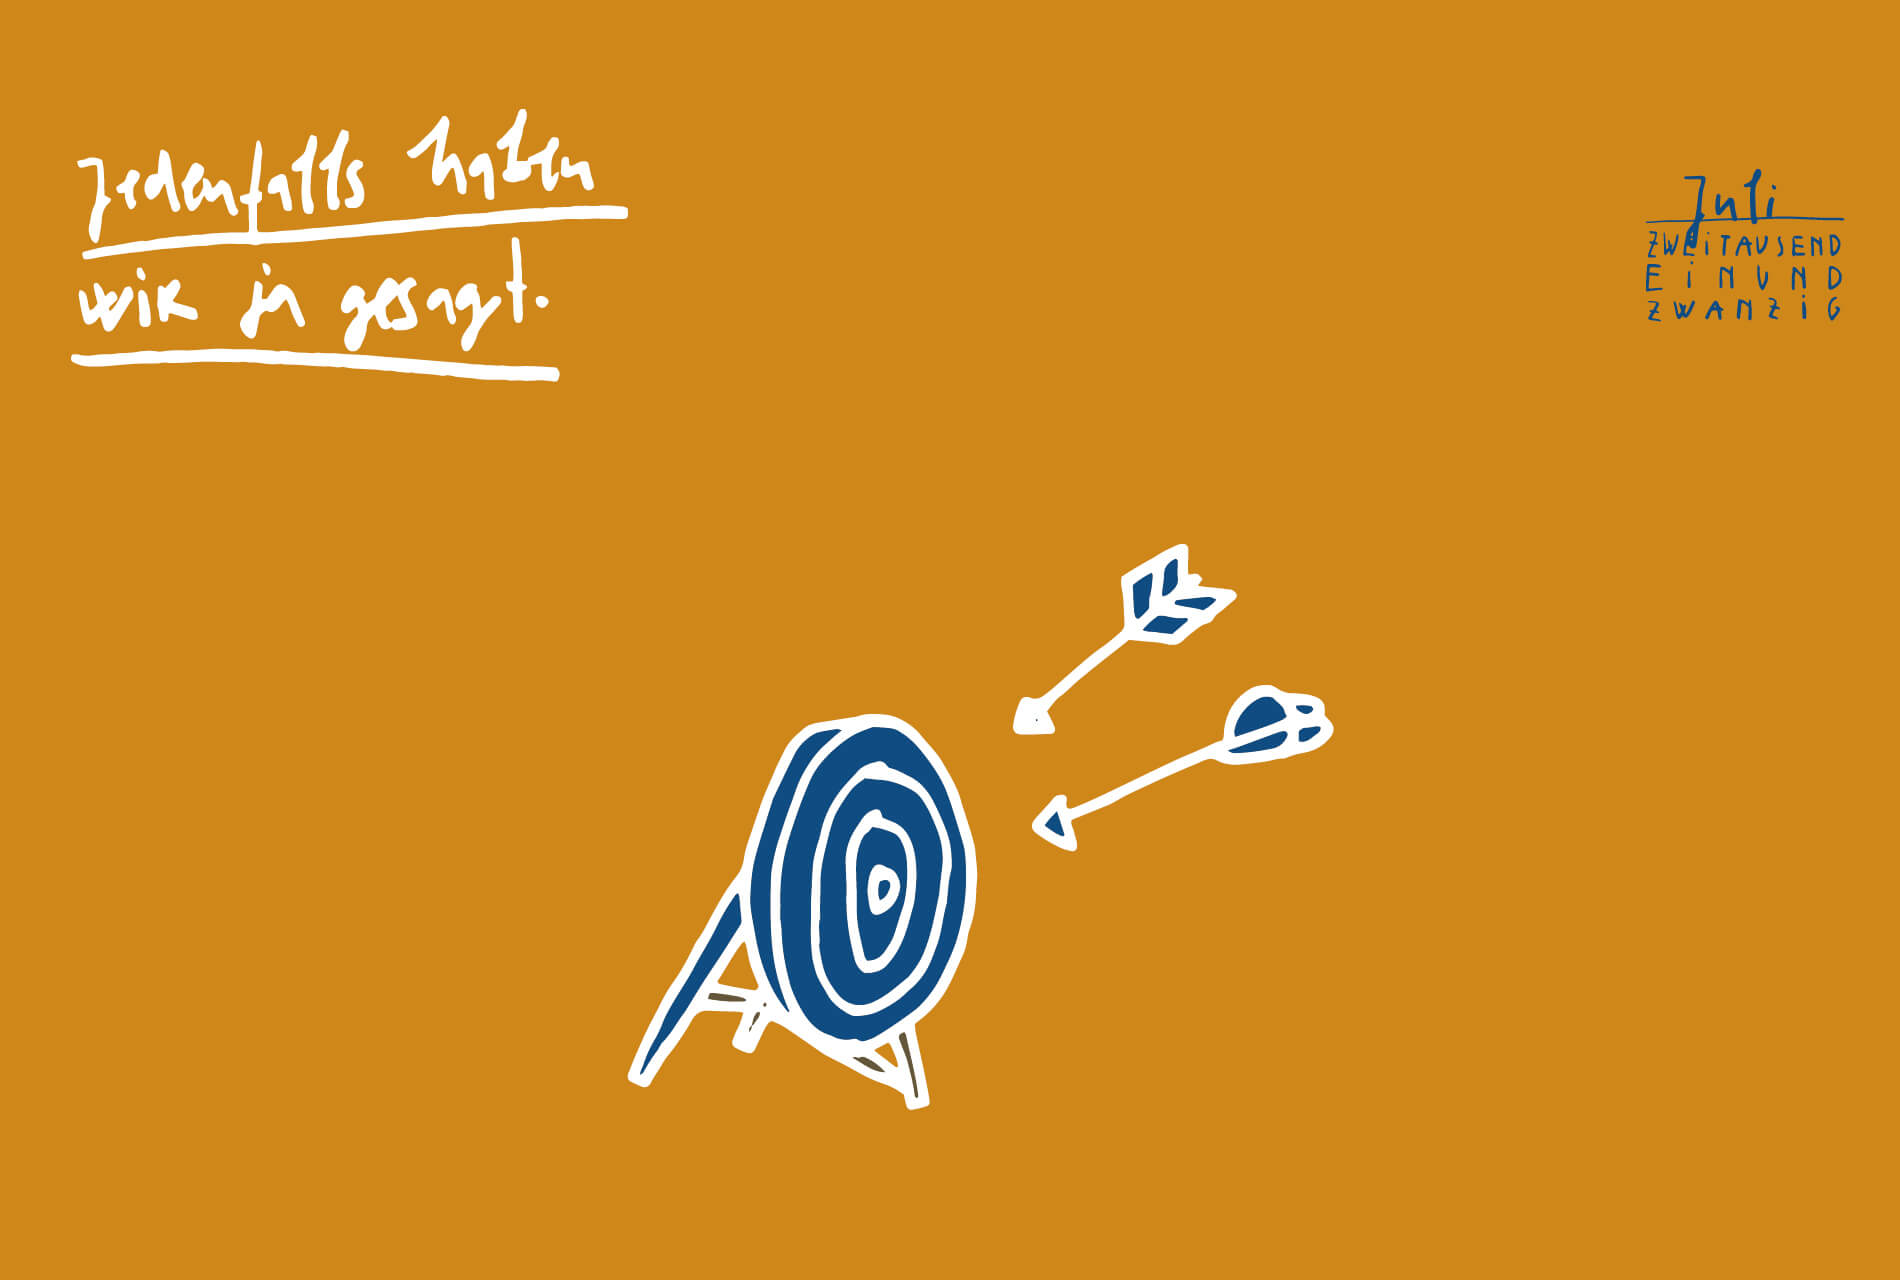 Matrosenhunde, Illustration, Kalender, 2021 Matrosenhunde, Illustration, Zeichnung, Illustratorin, Text, Prosa, Monatskalender, Juli, Kunstkalender, Illustrationskalender,Jedenfalls haben wir ja gesagt